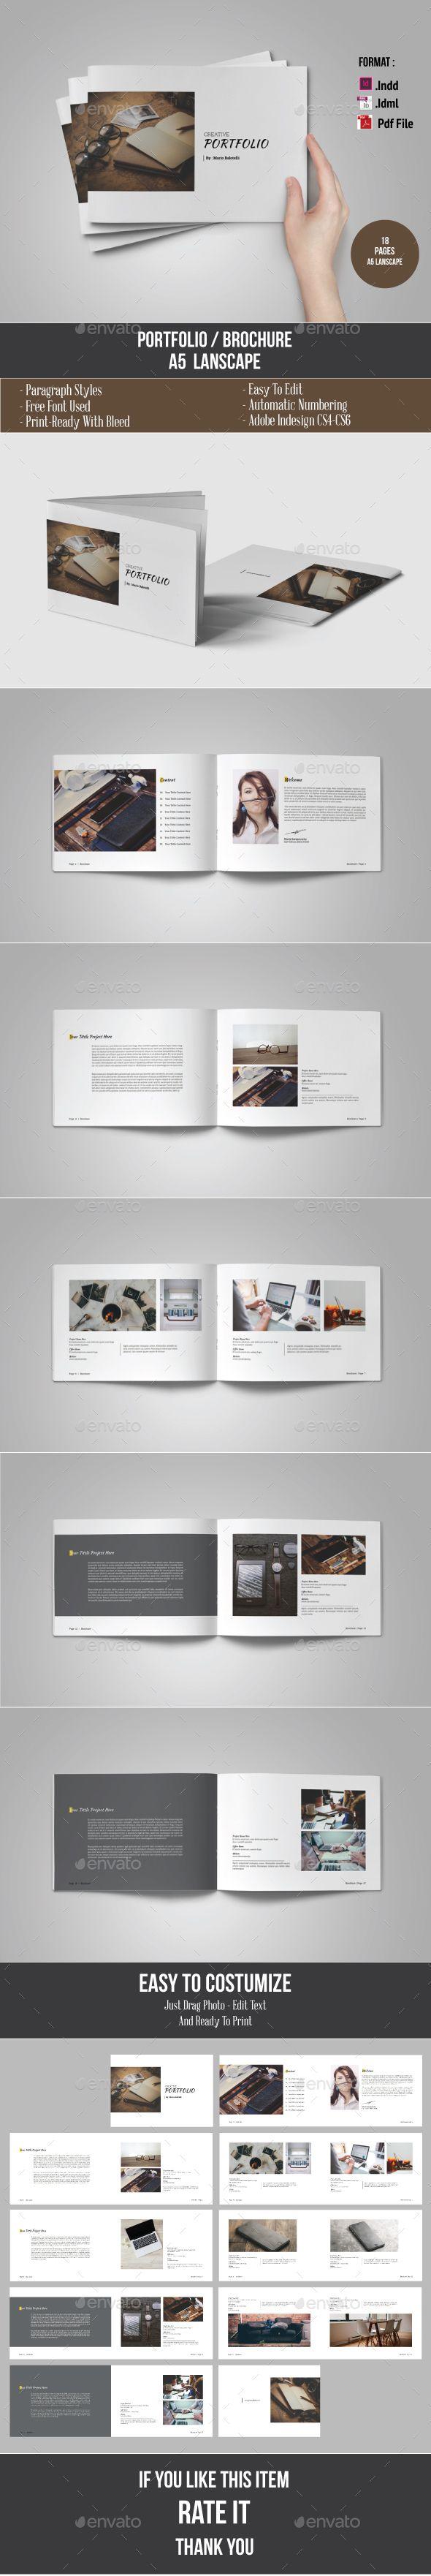 A5 Portfolio Brochure Template InDesign INDD. Download here: http://graphicriver.net/item/a5-portfolio-template/15087353?ref=ksioks